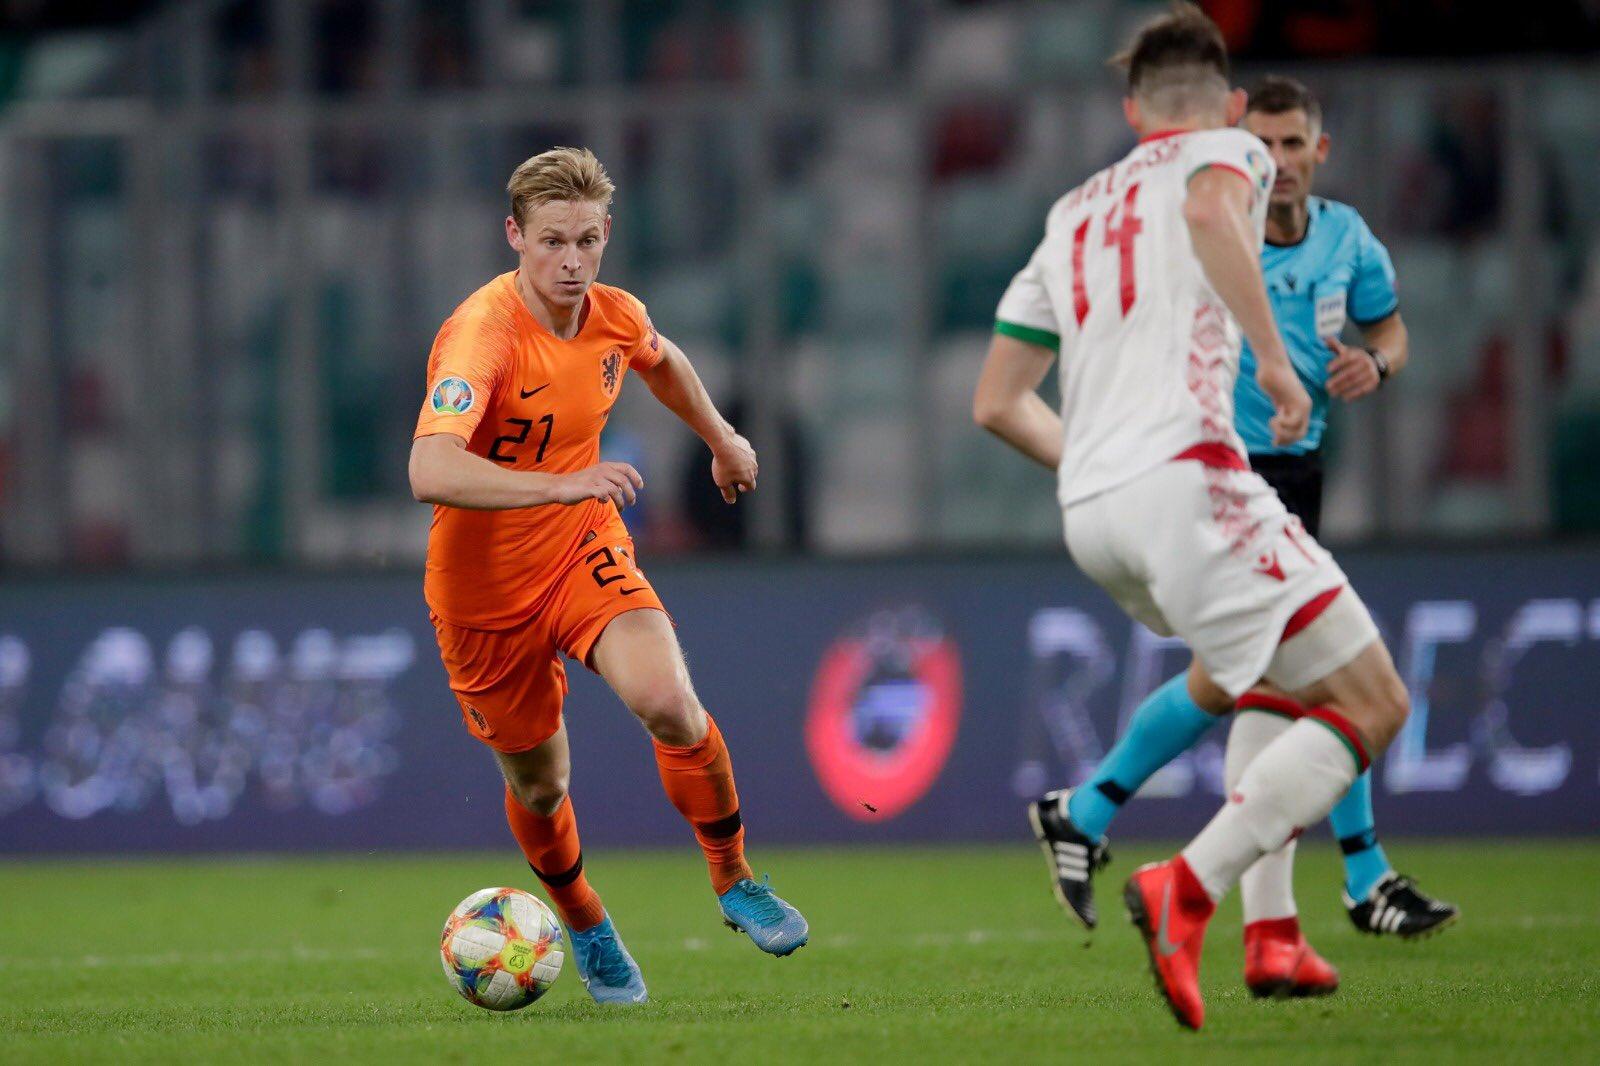 Ter Stegen and De Jong qualify for the European Championship